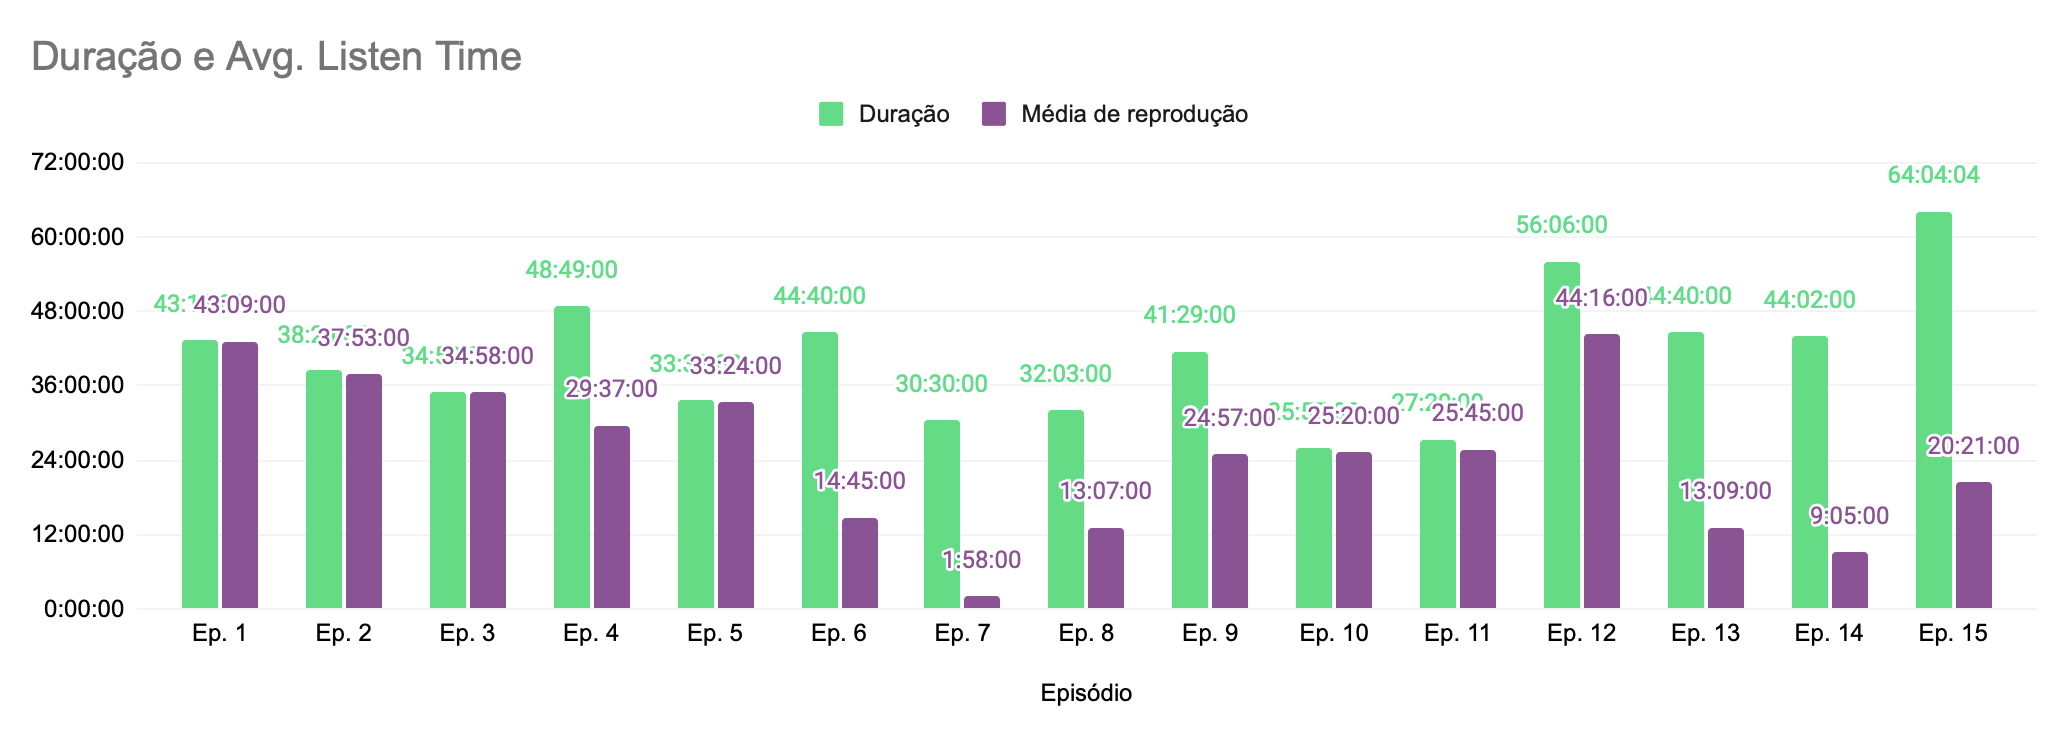 Average listen time dos episódios no Spotify for Podcasters